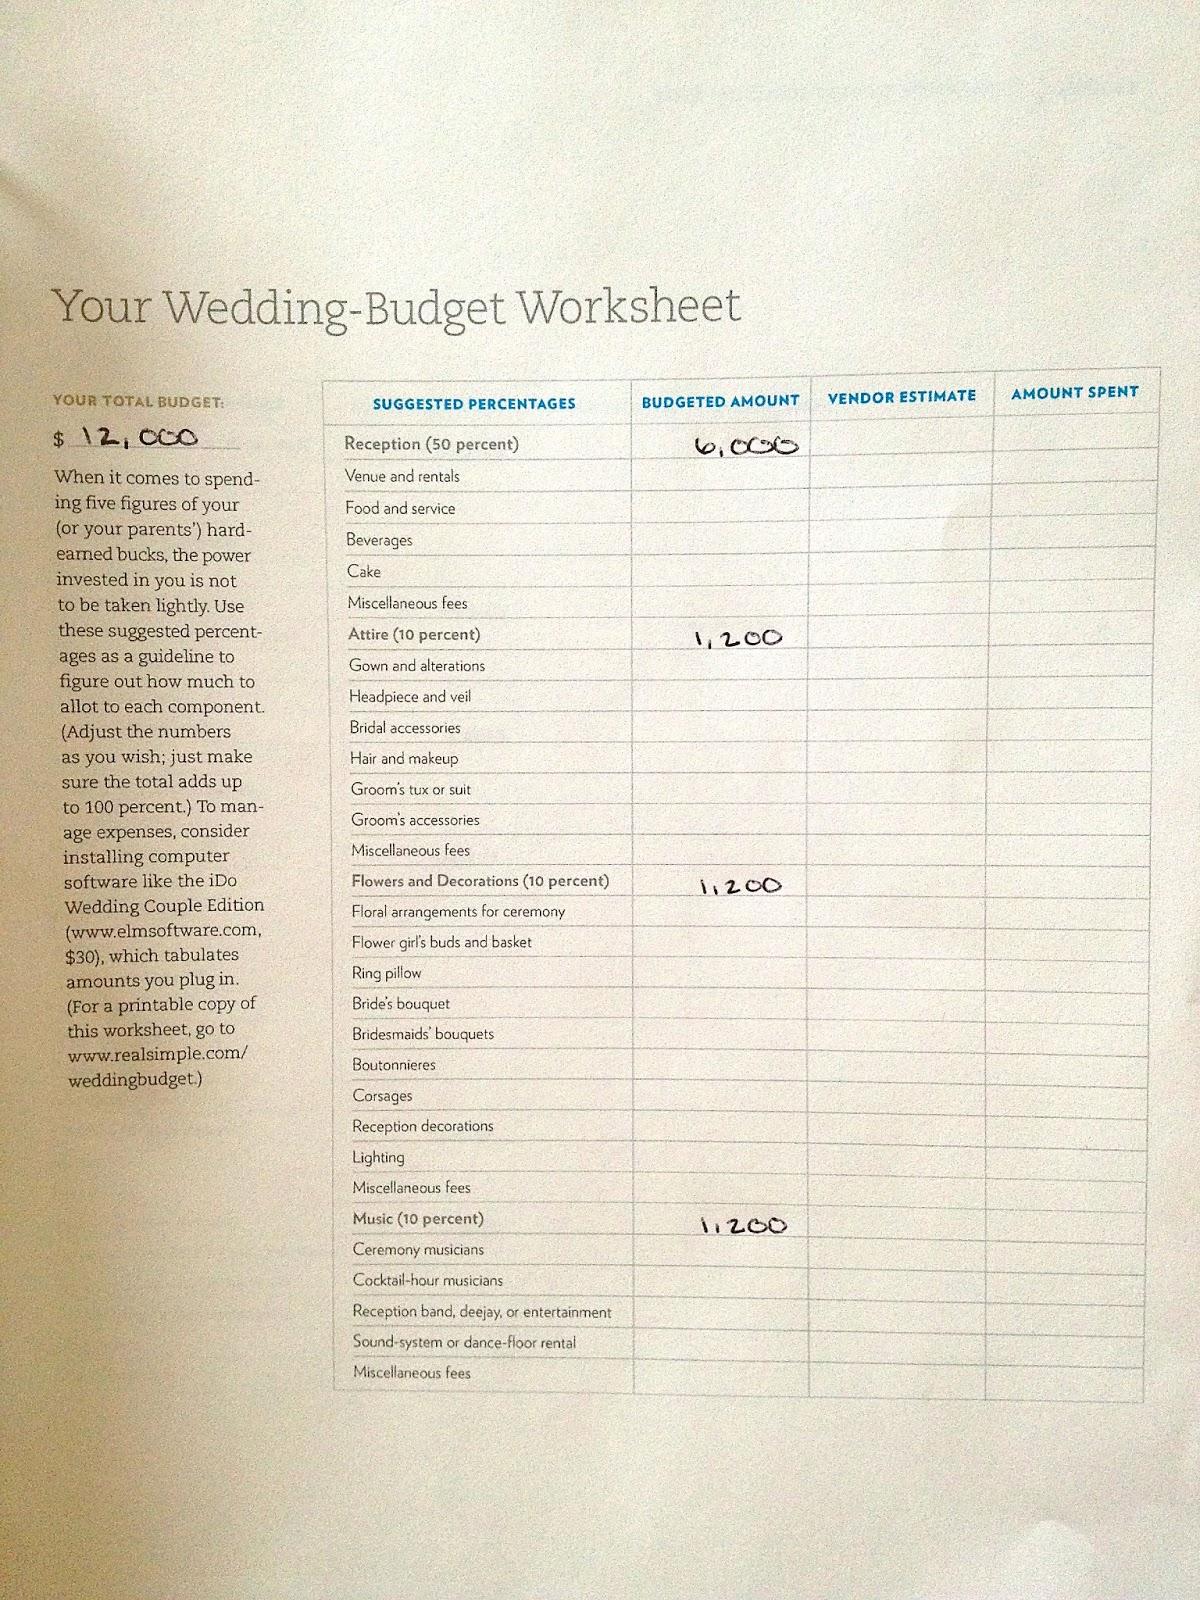 A High Strung Bride On A Budget So Let S Talk Money